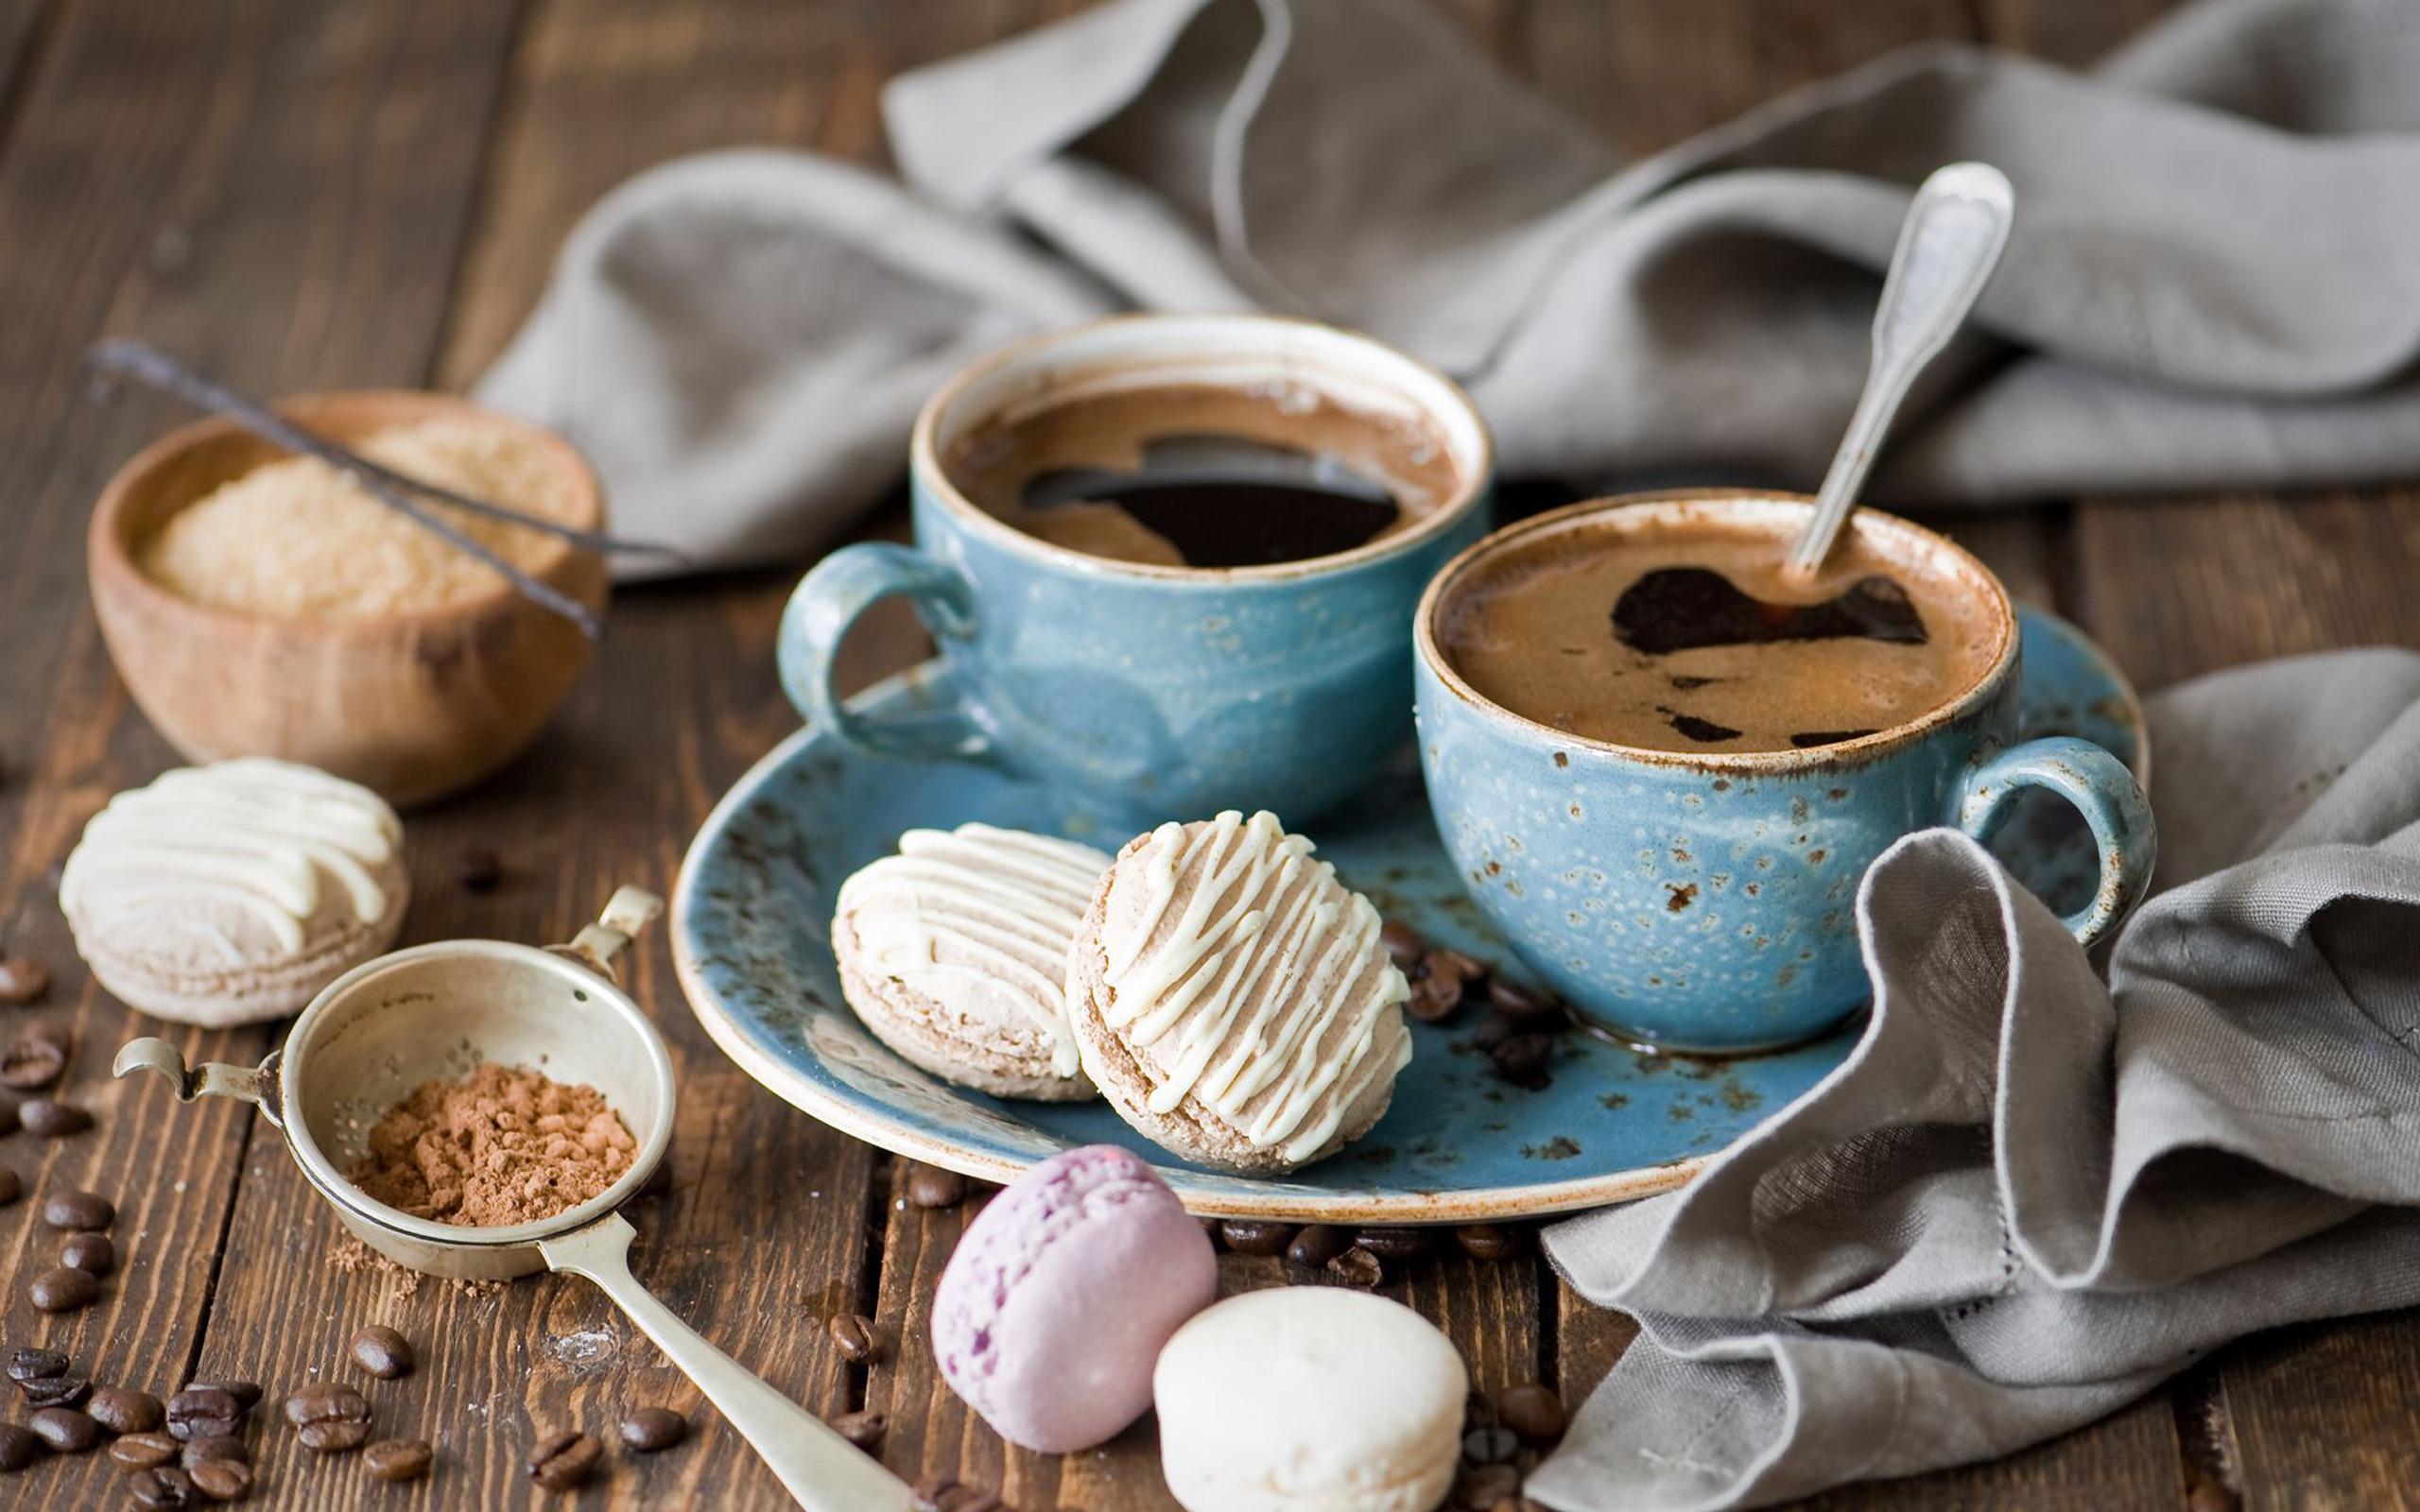 2560 x 1600 - 1801k - jpg 3840 Coffee and sweets ...